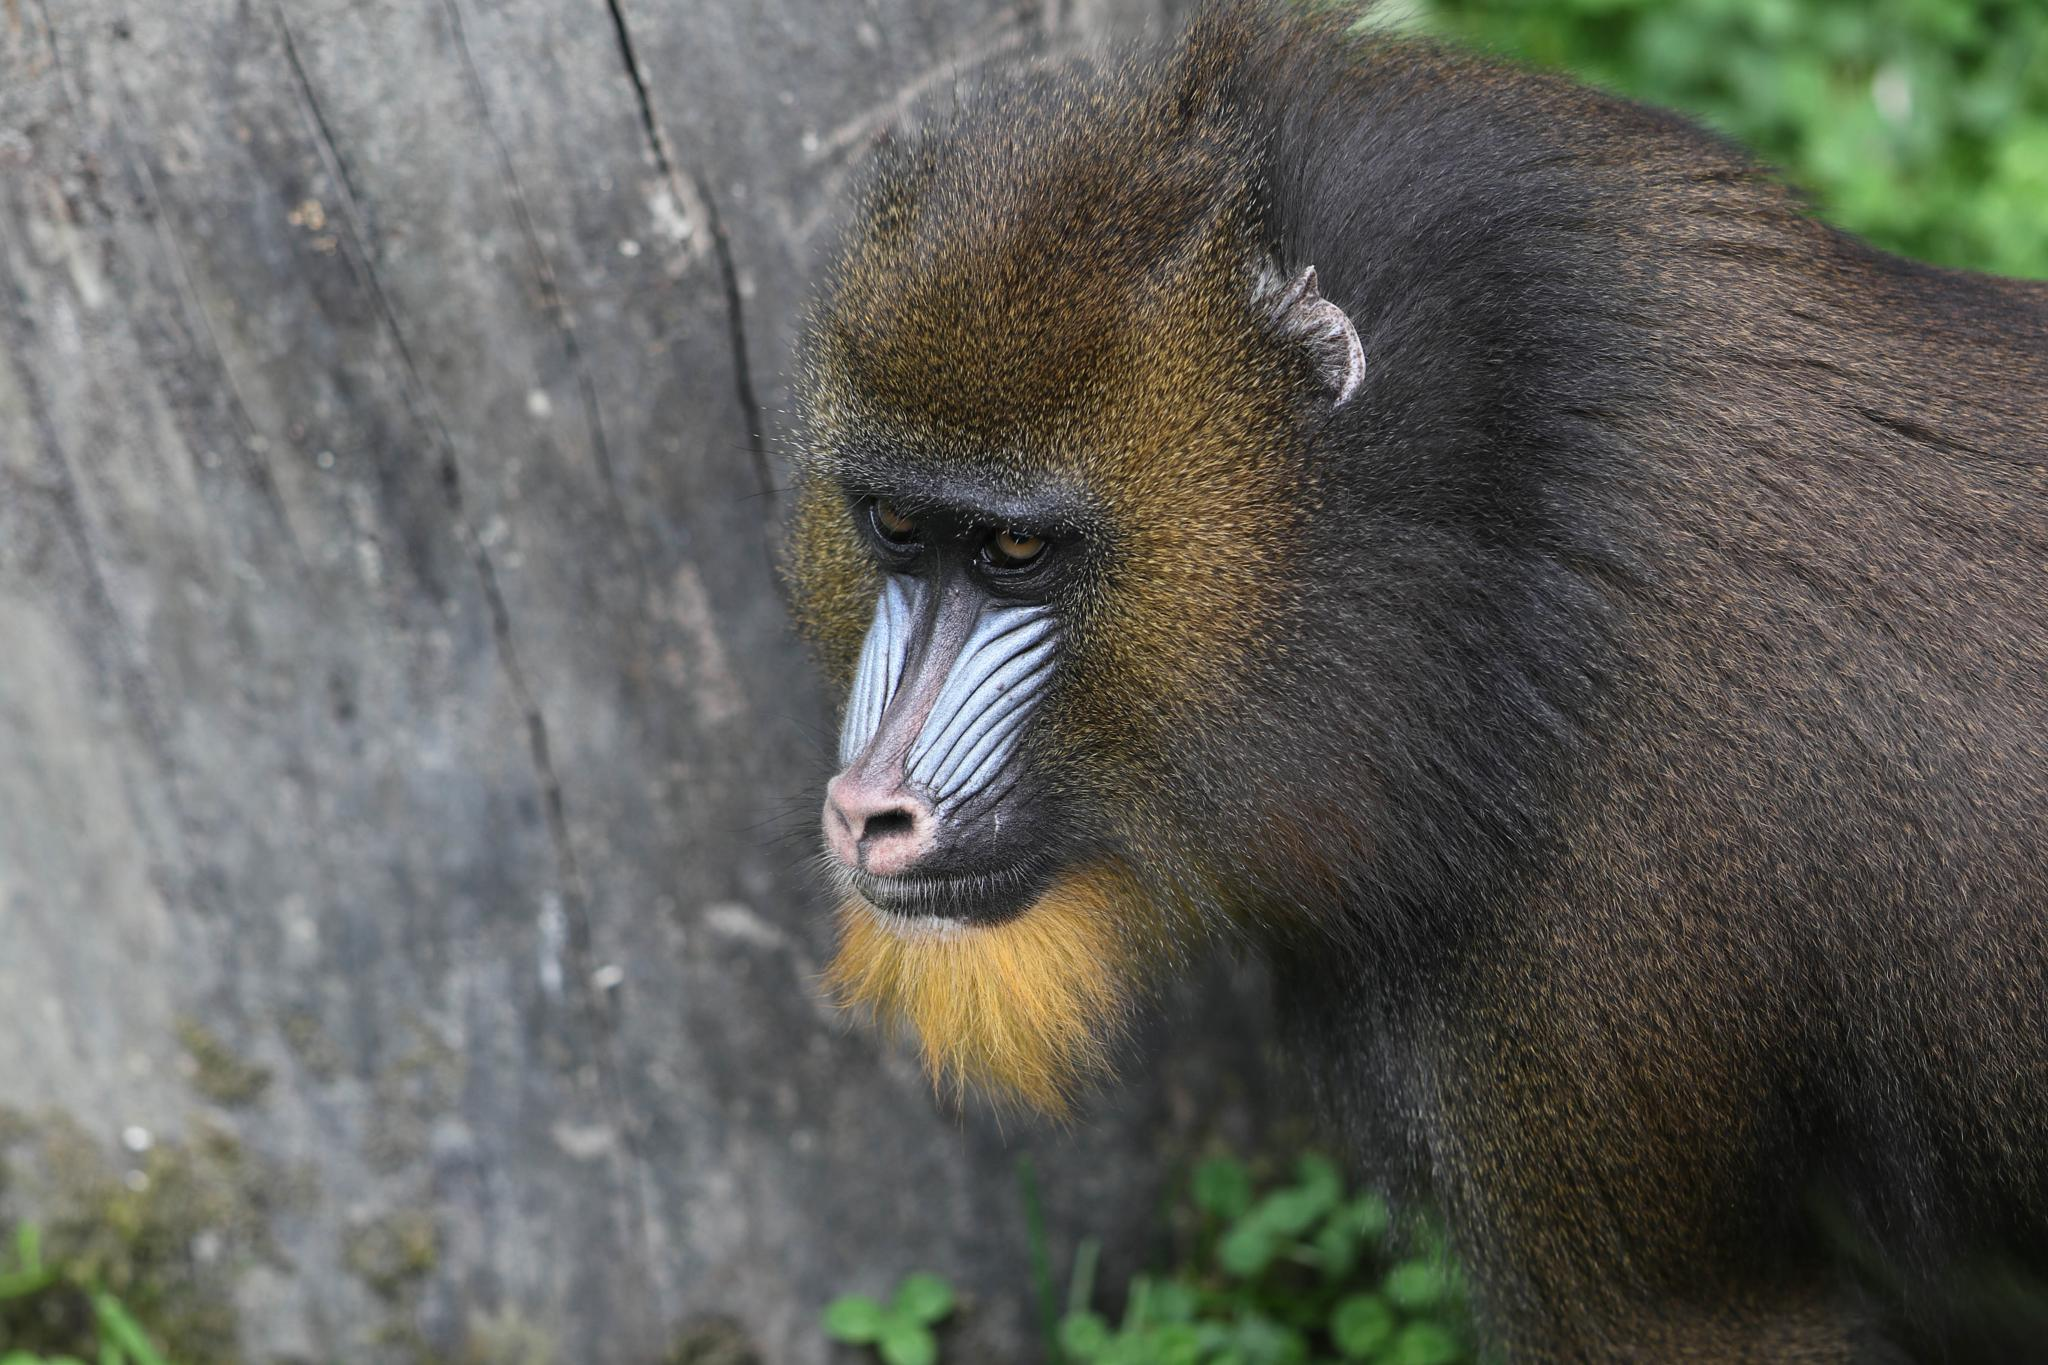 Baboon by emmanuel liegeois